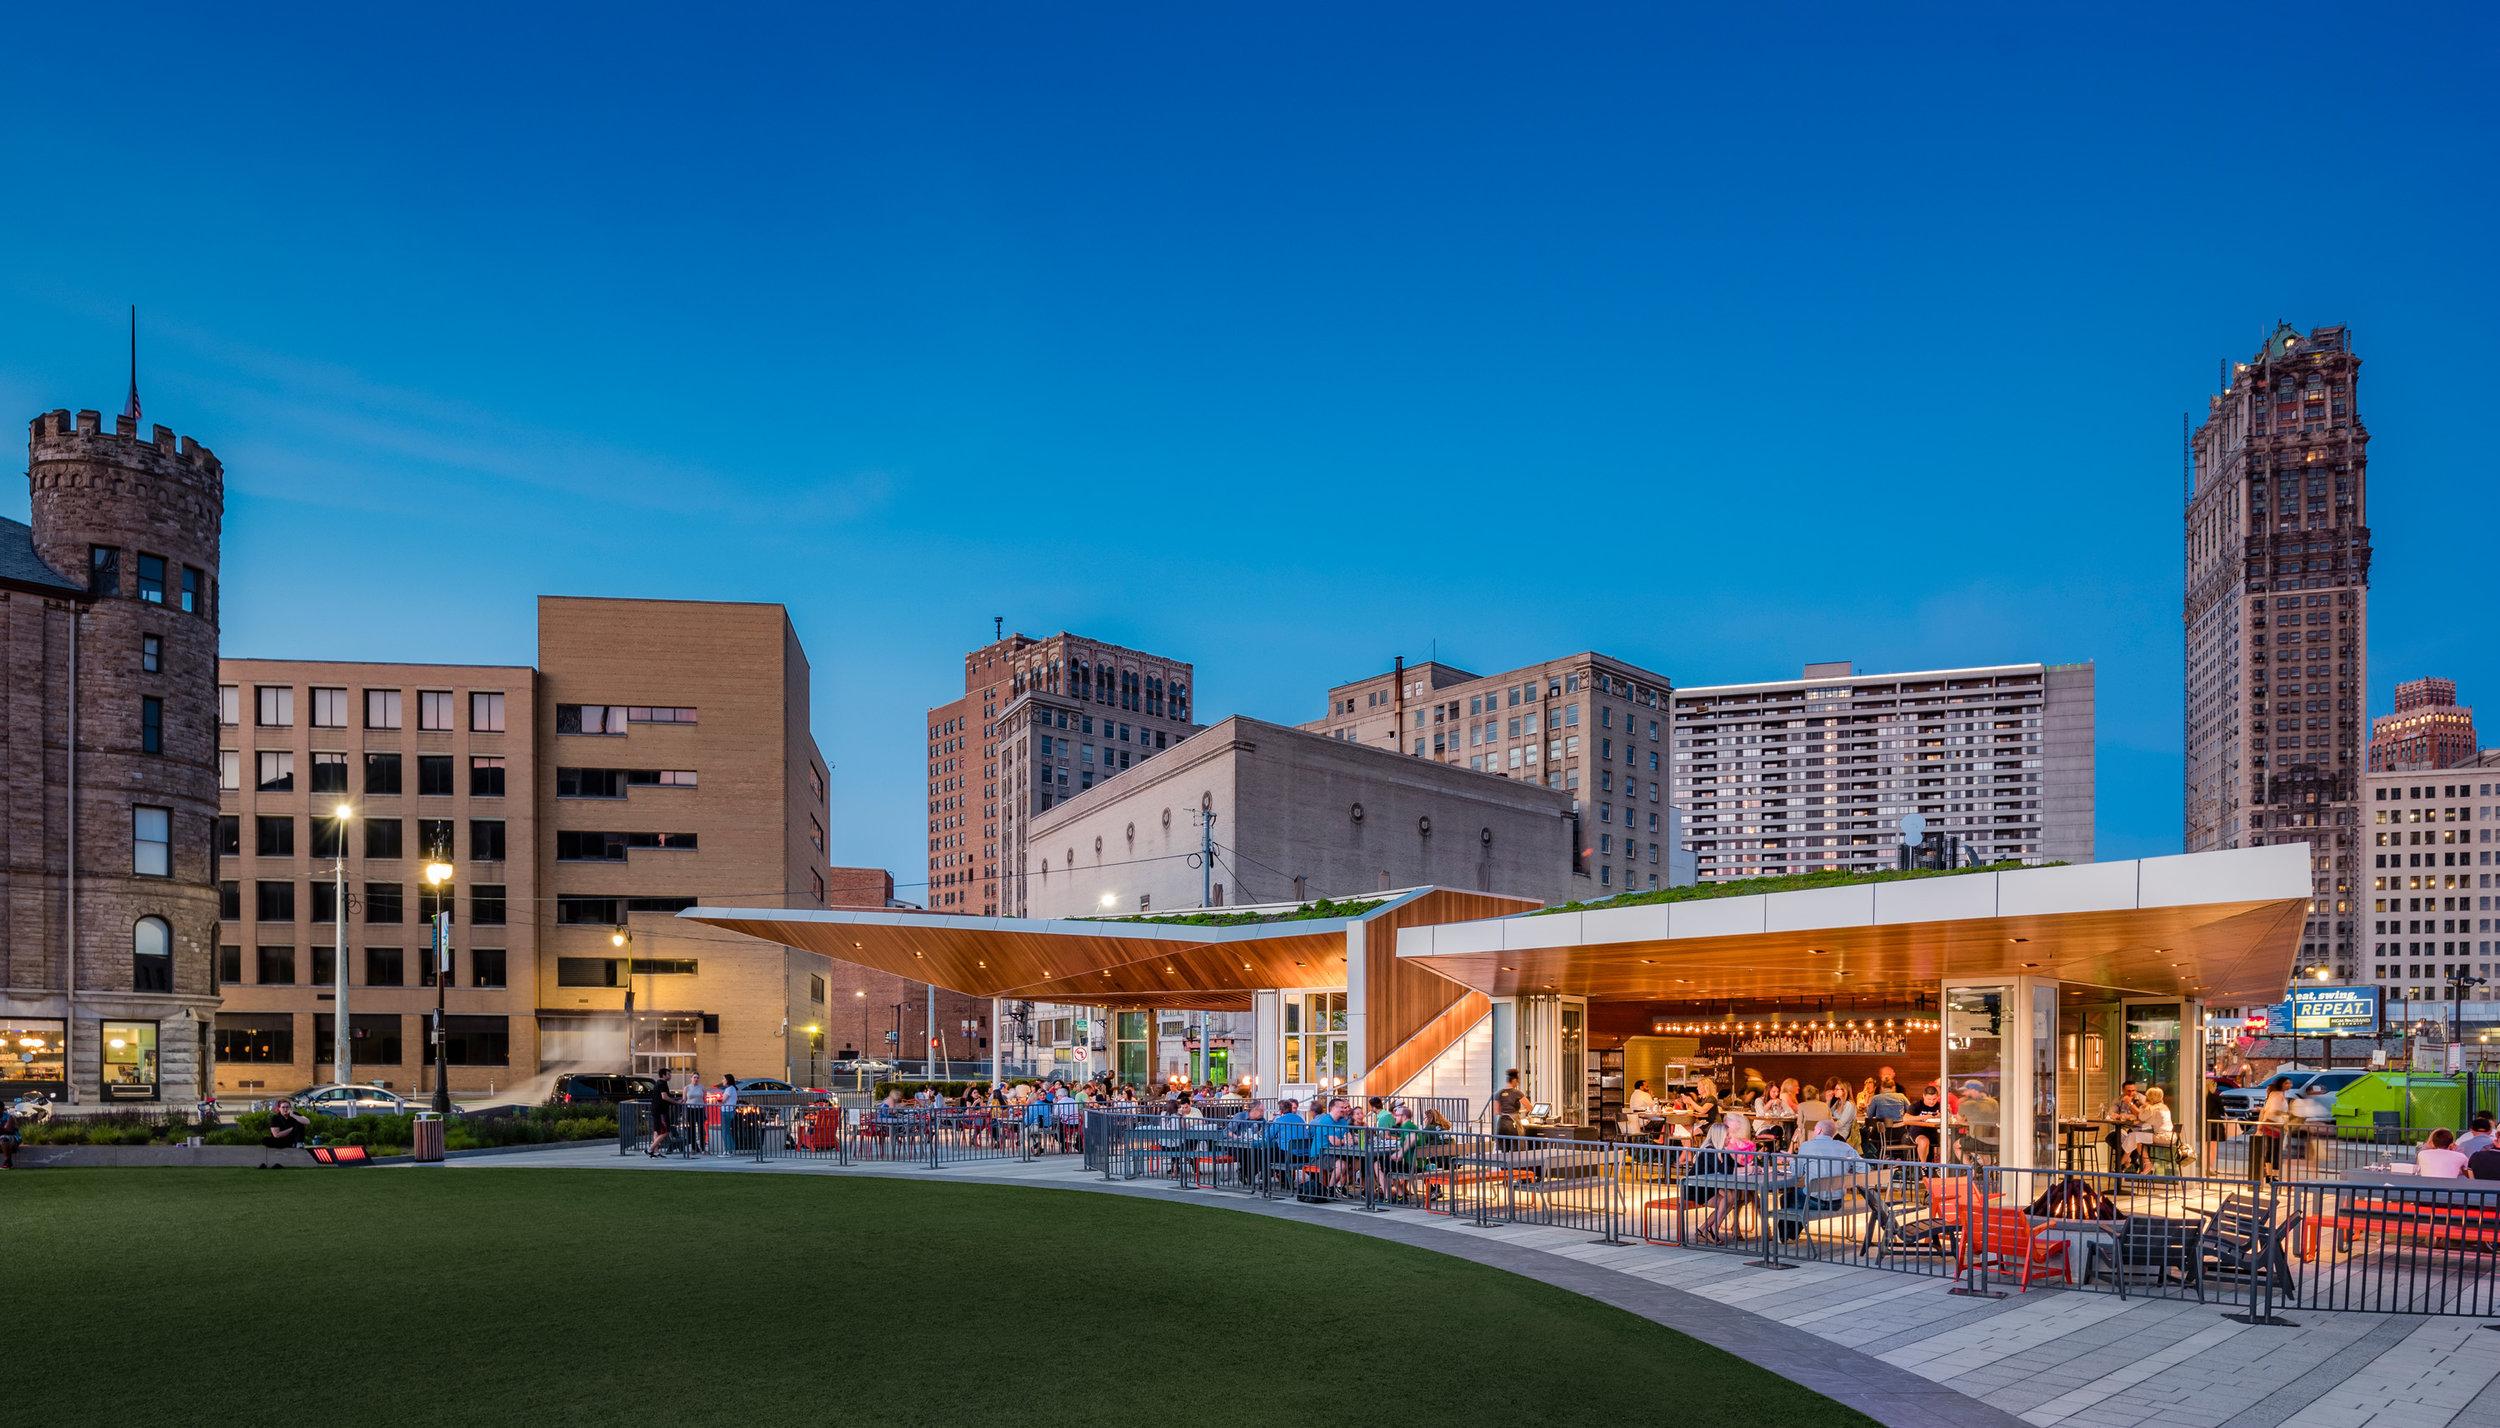 Evening view of Lumen at Beacon Park in Detroit (photo by Anton Grassl)